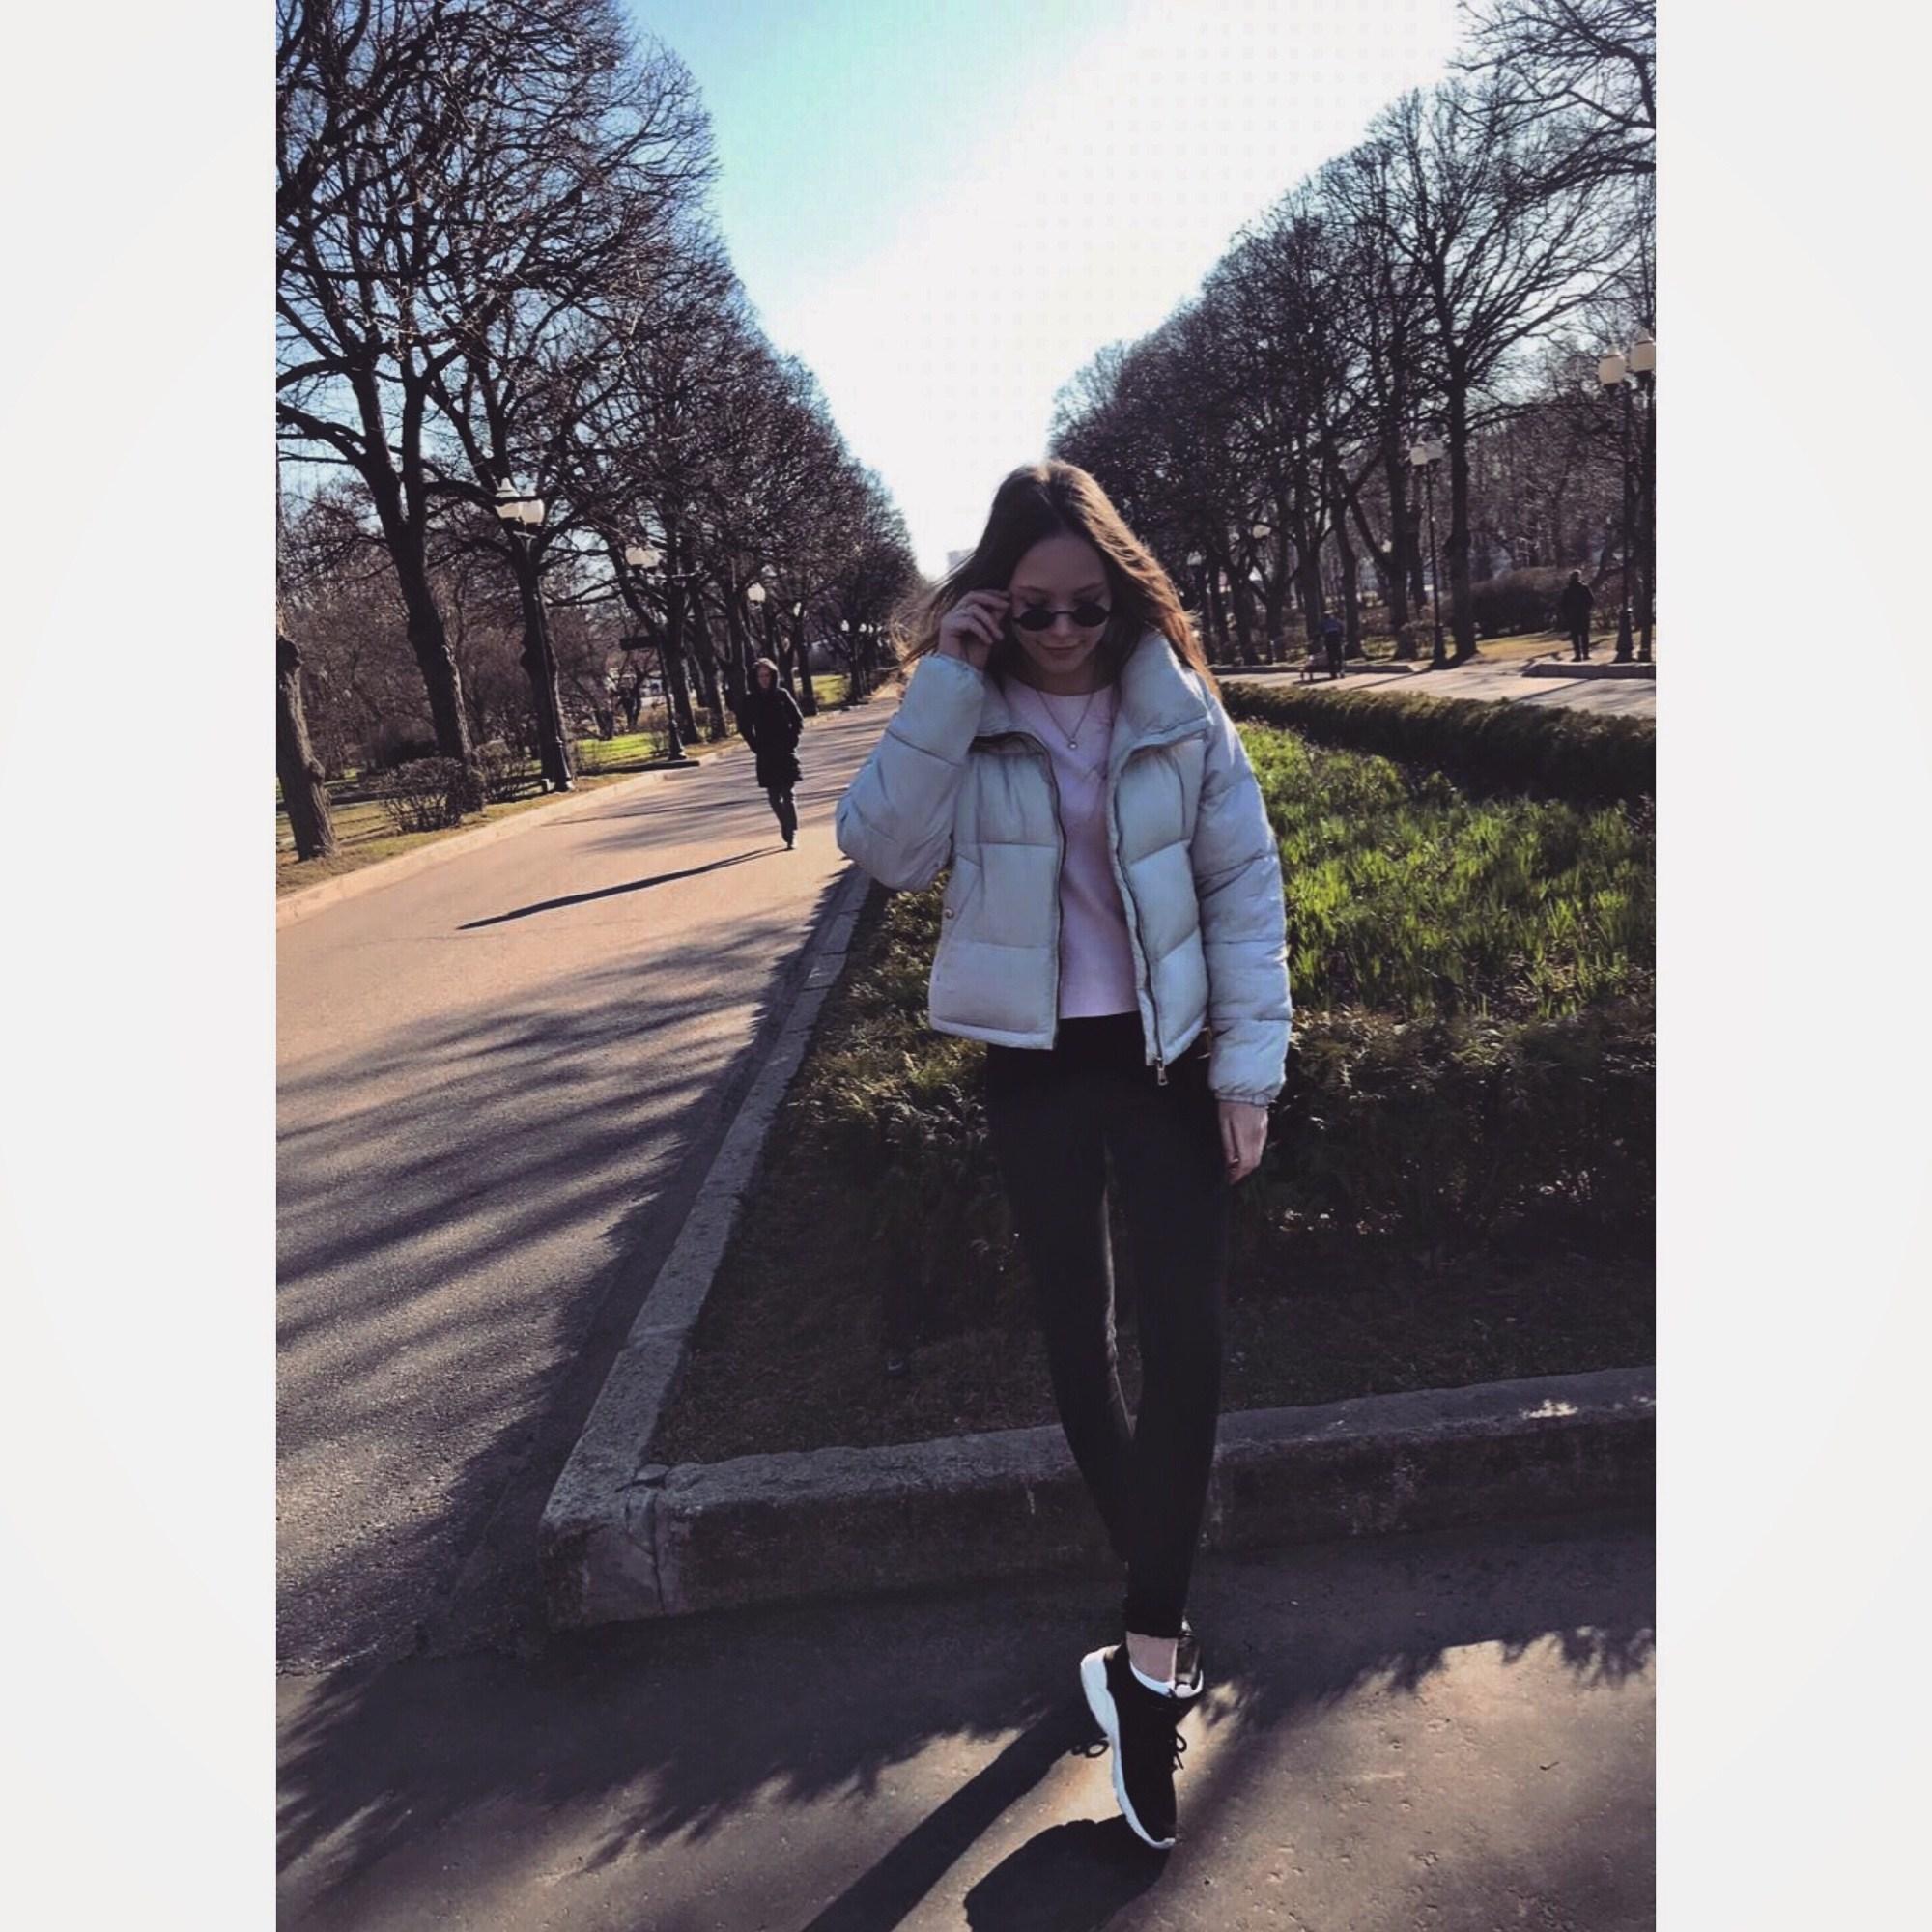 lena_123_16's Cover Photo